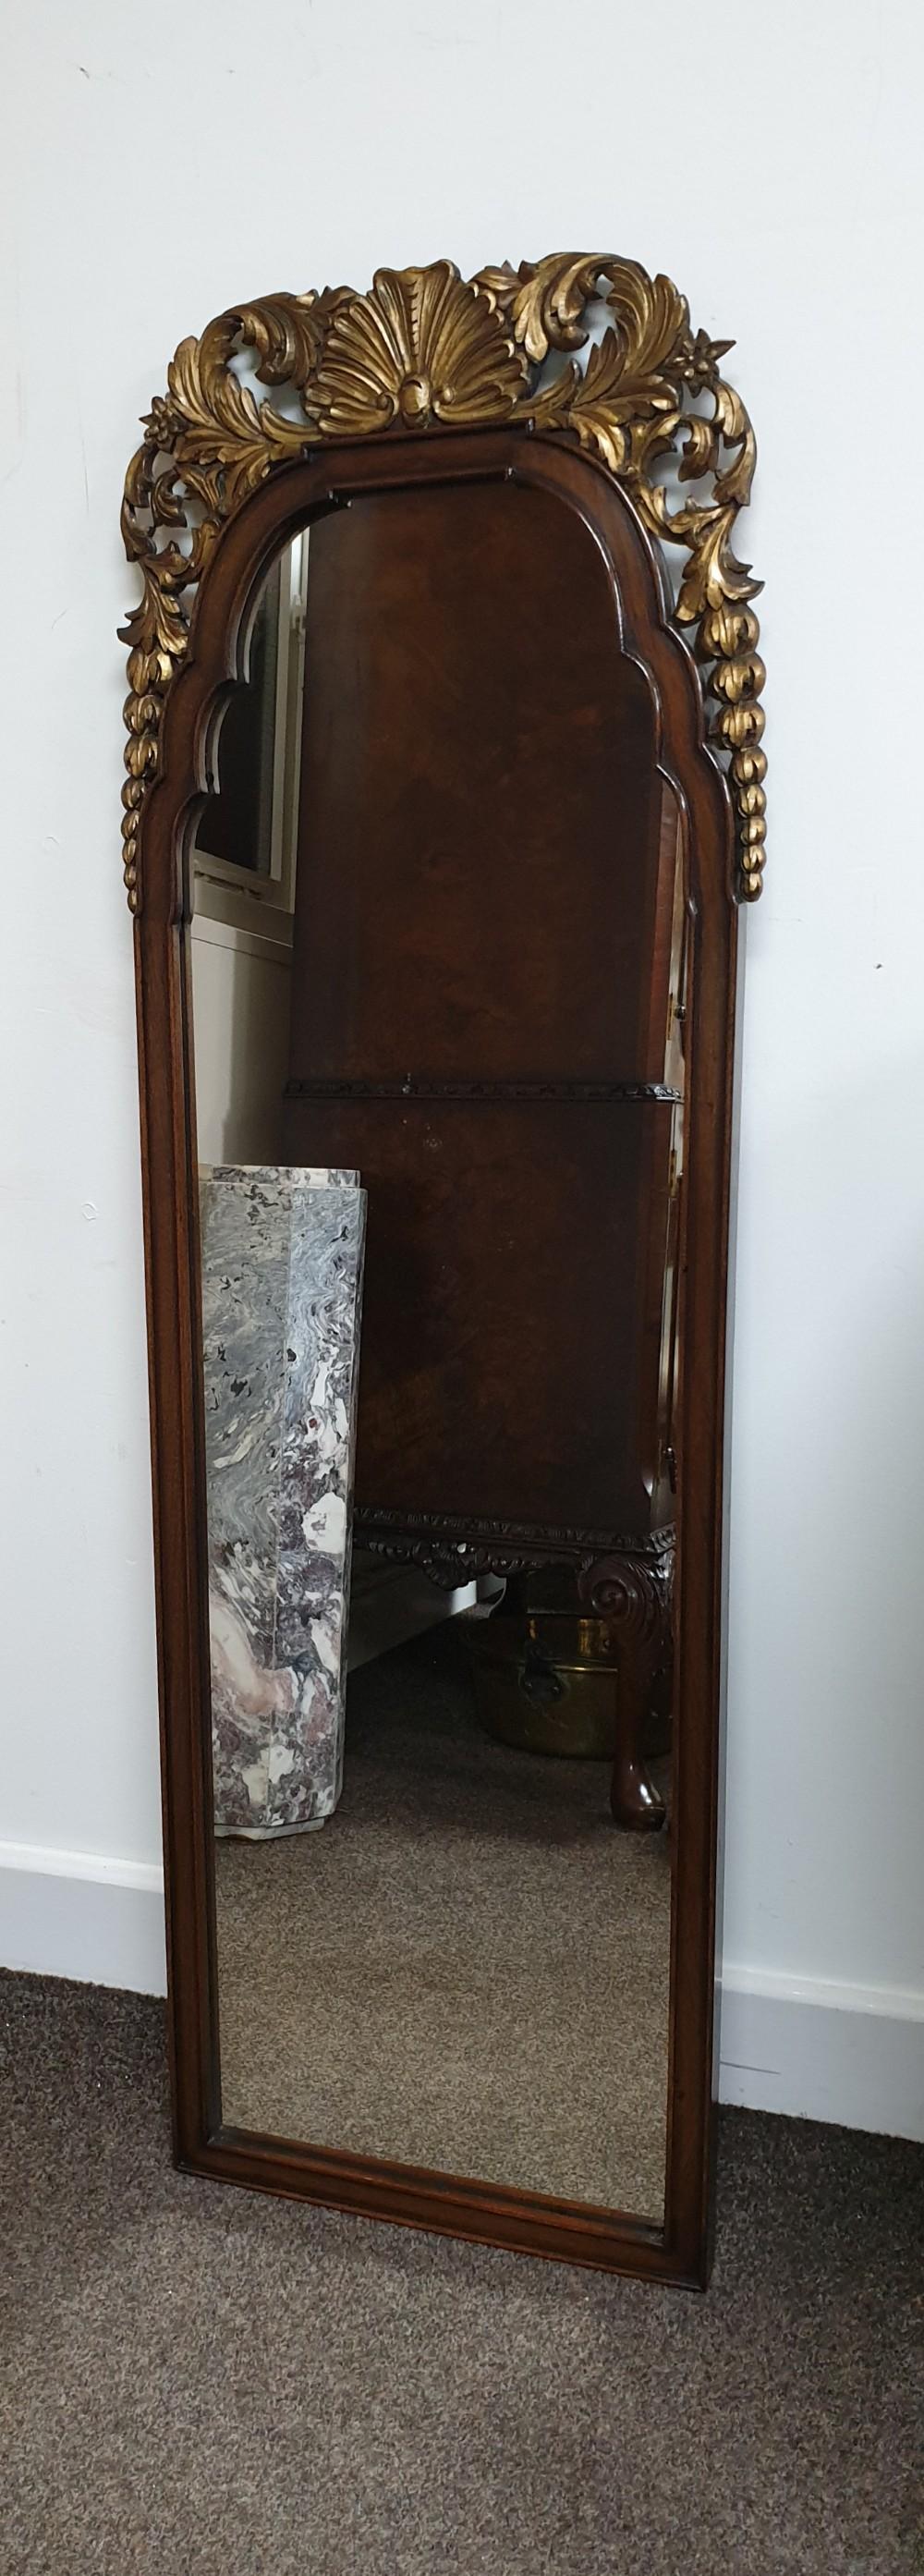 walnut and parcel gilt hall mirror